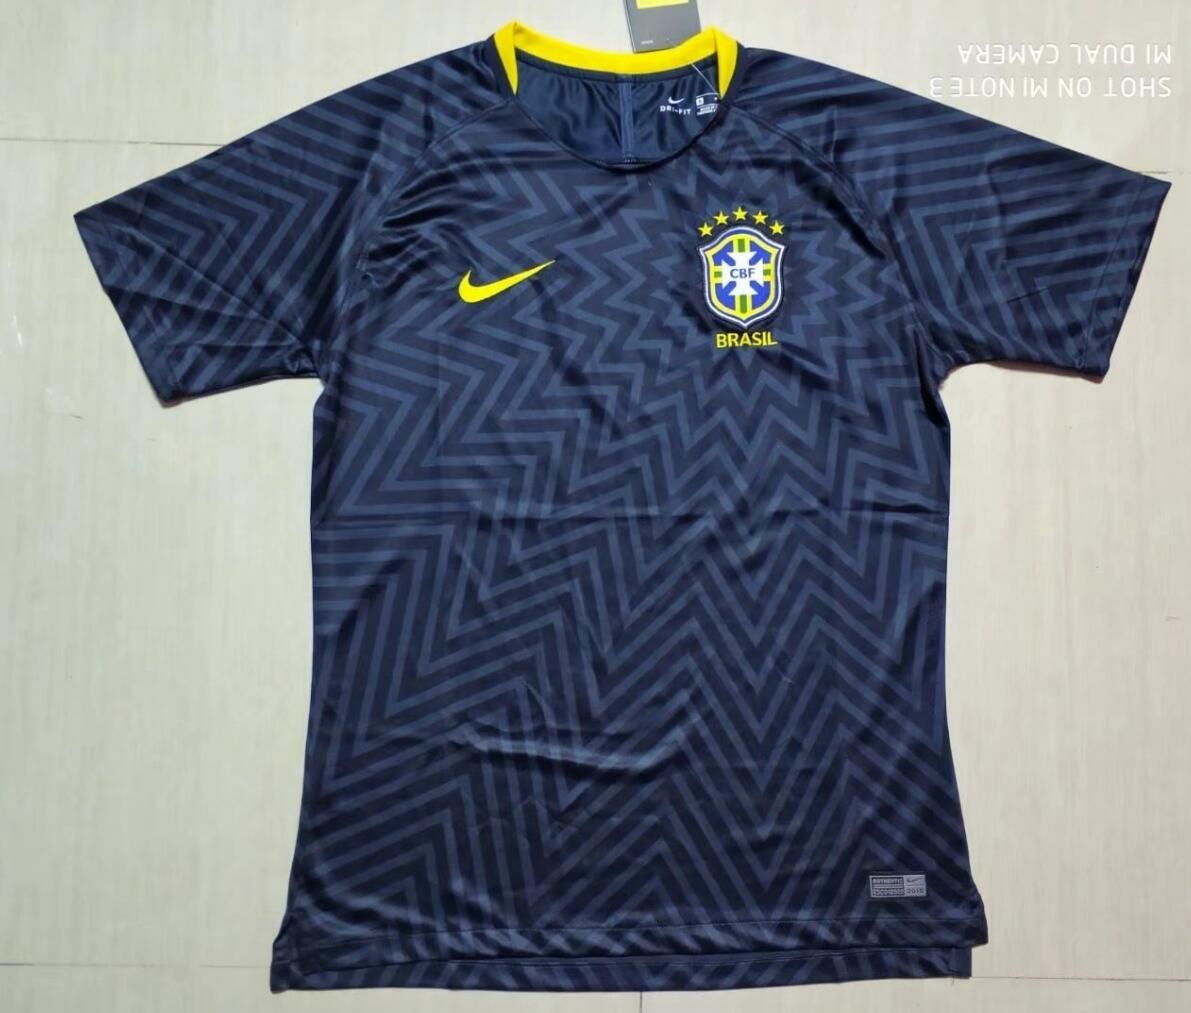 d2fd79e790 camisetas brasil brasileira passeio-treino camisa neymar. Carregando zoom.